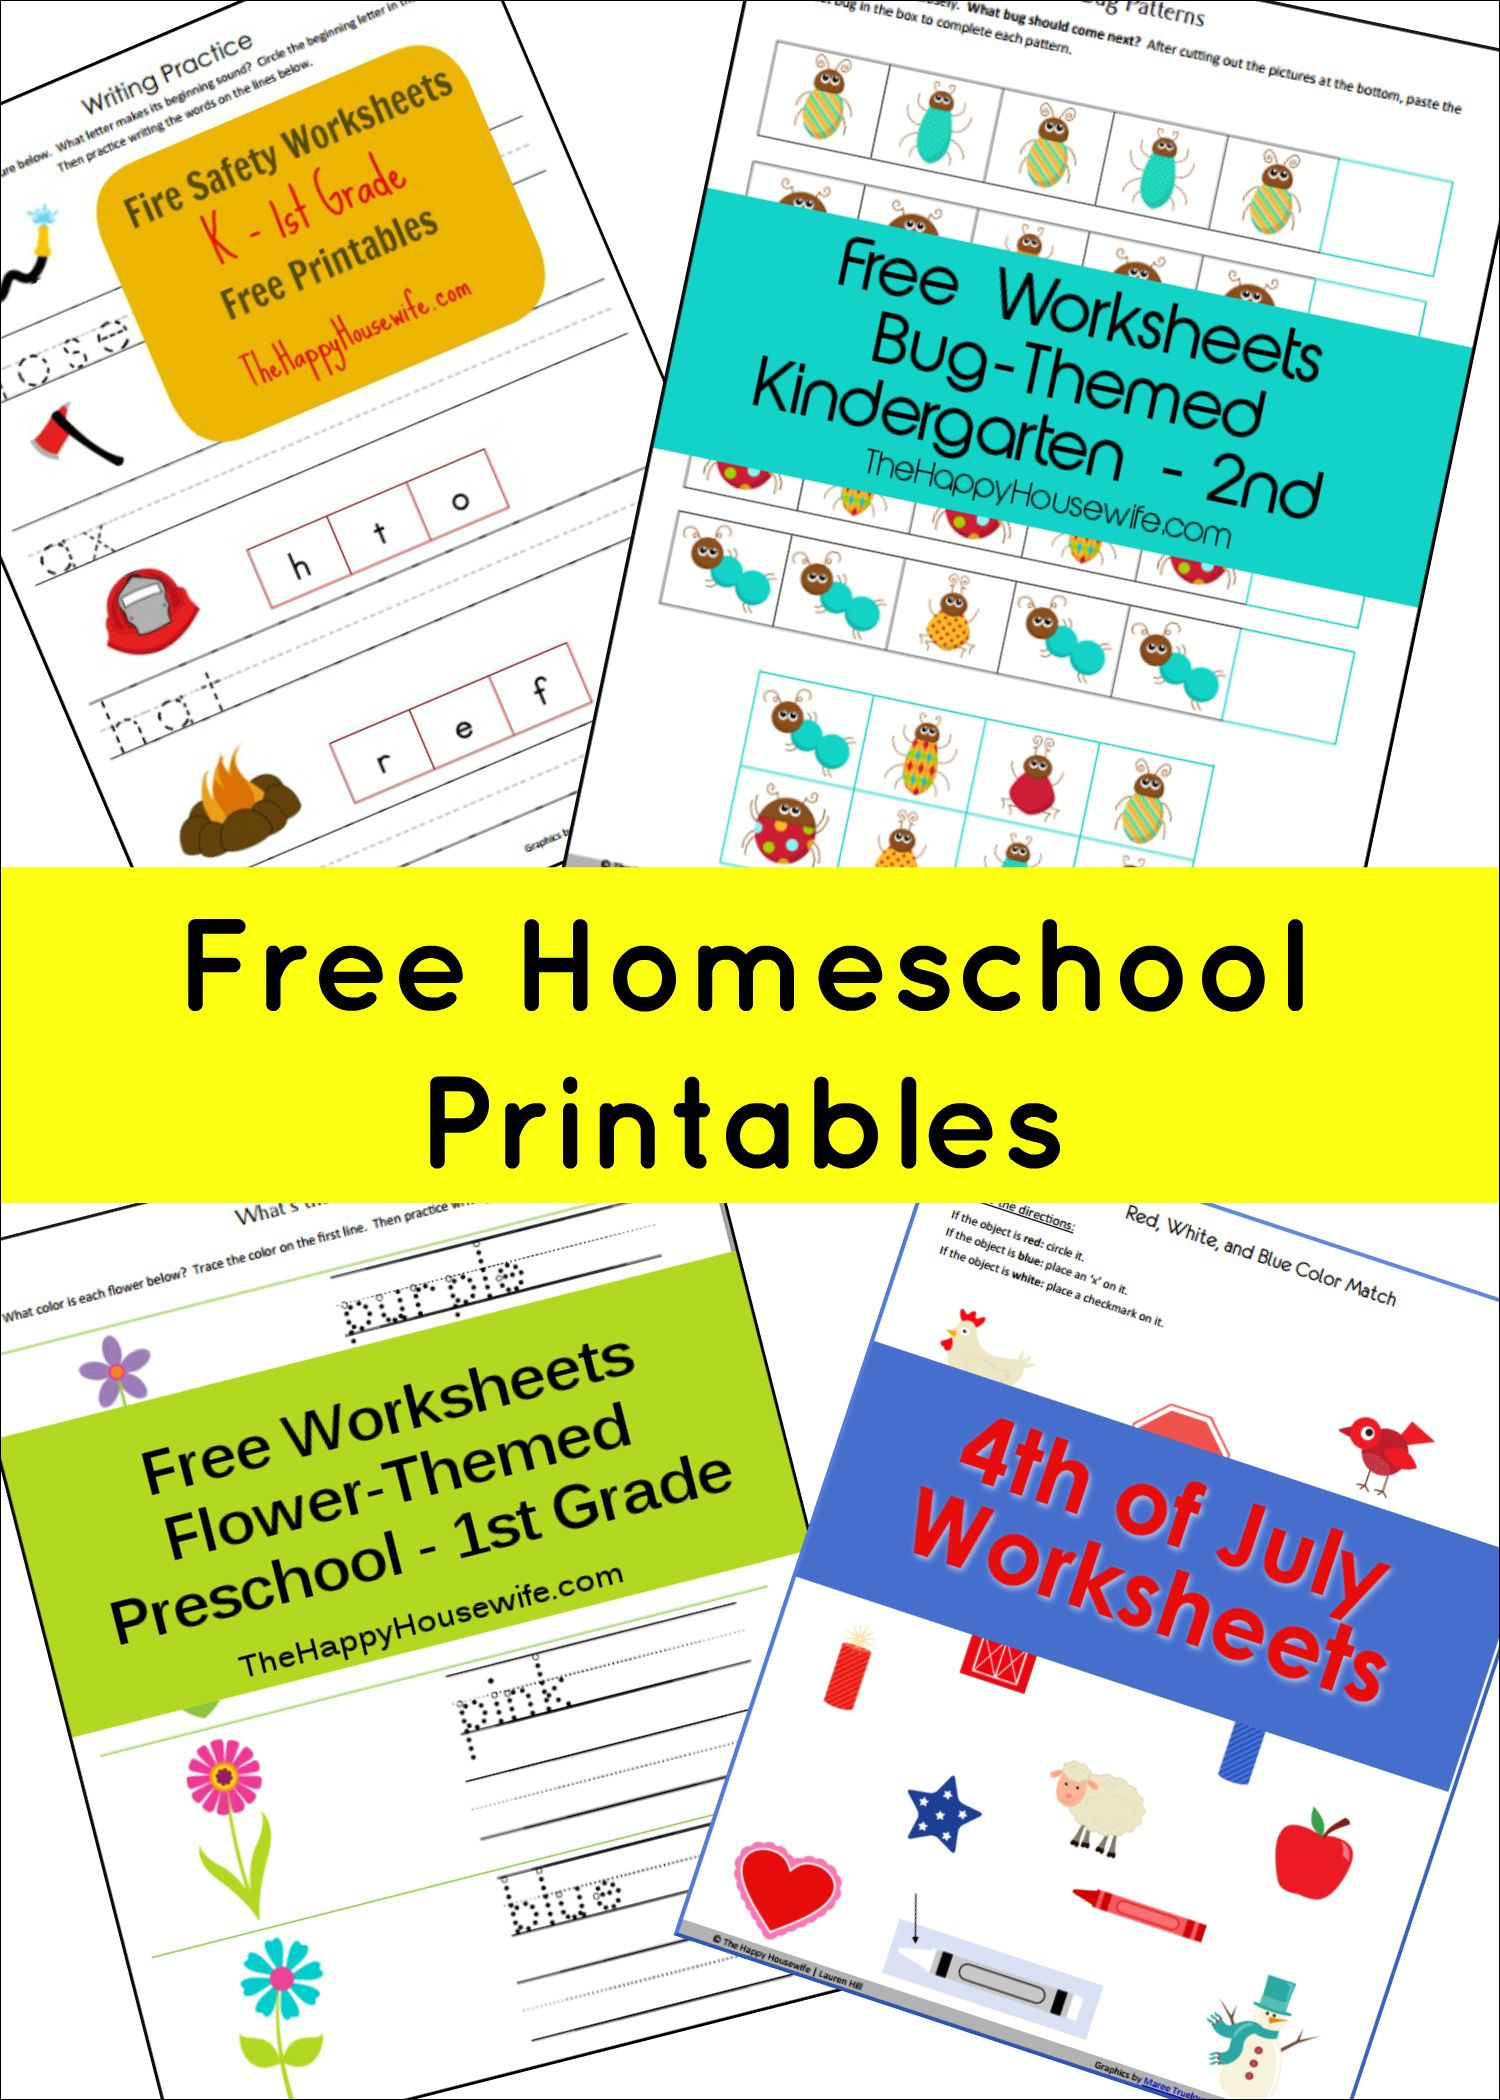 Homeschool Free Printables Homeschool Worksheets And Calendar Time